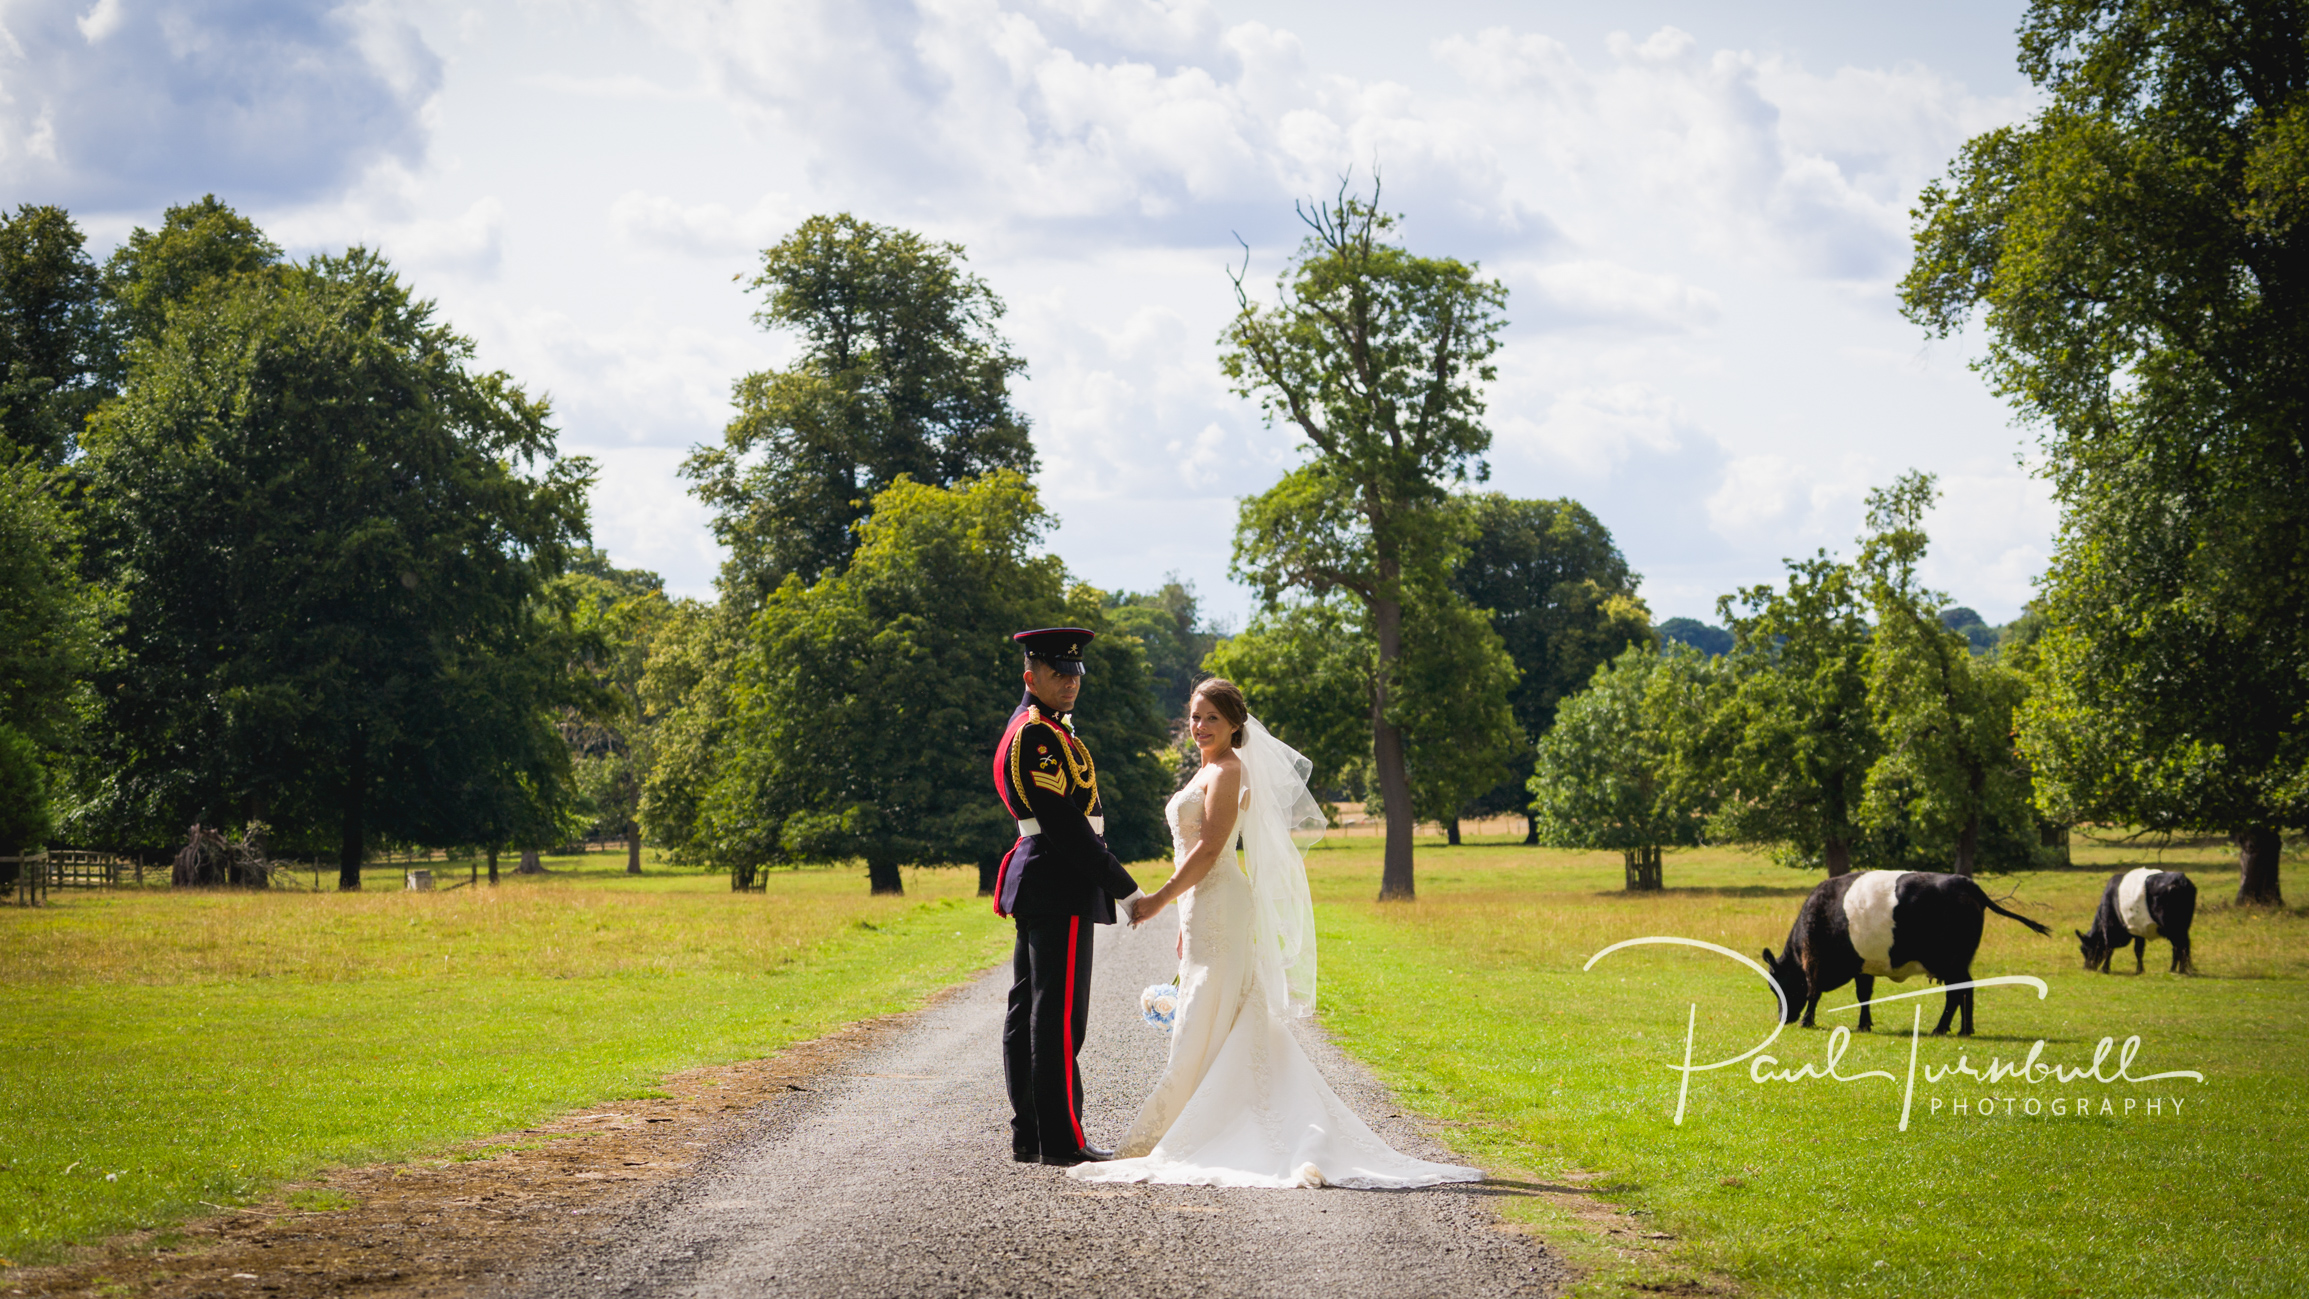 wedding-photographer-south-dalton-walkington-yorkshire-emma-james-050.jpg